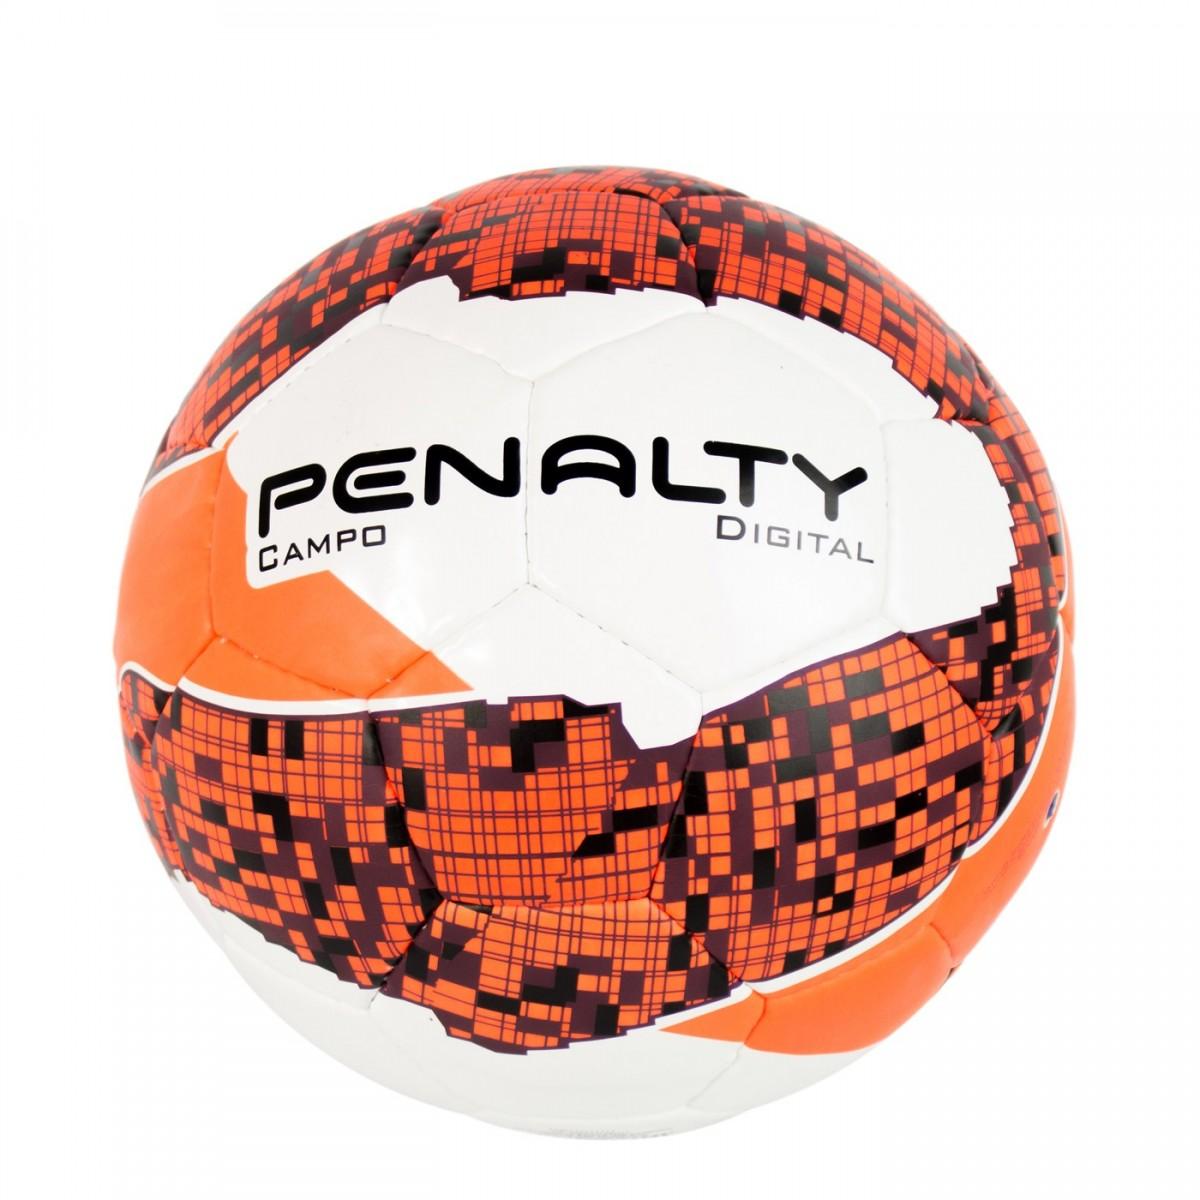 54b382960826b Bizz Store - Bola Futebol de Campo Penalty Digital C C Branca